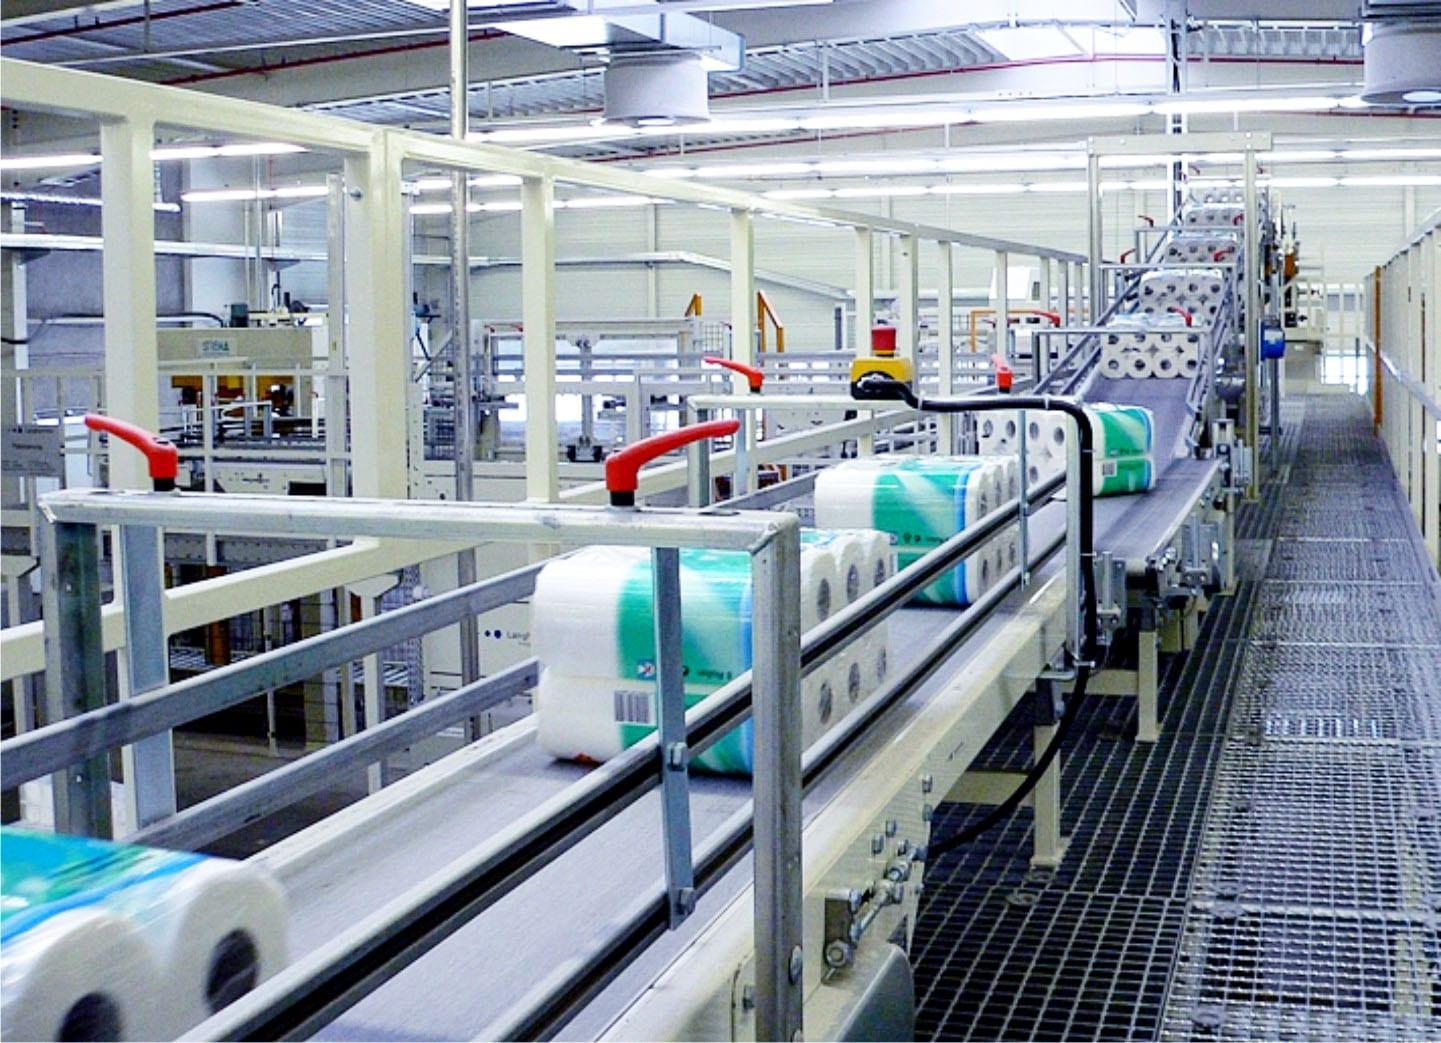 conveyor-systems-inside-left-large